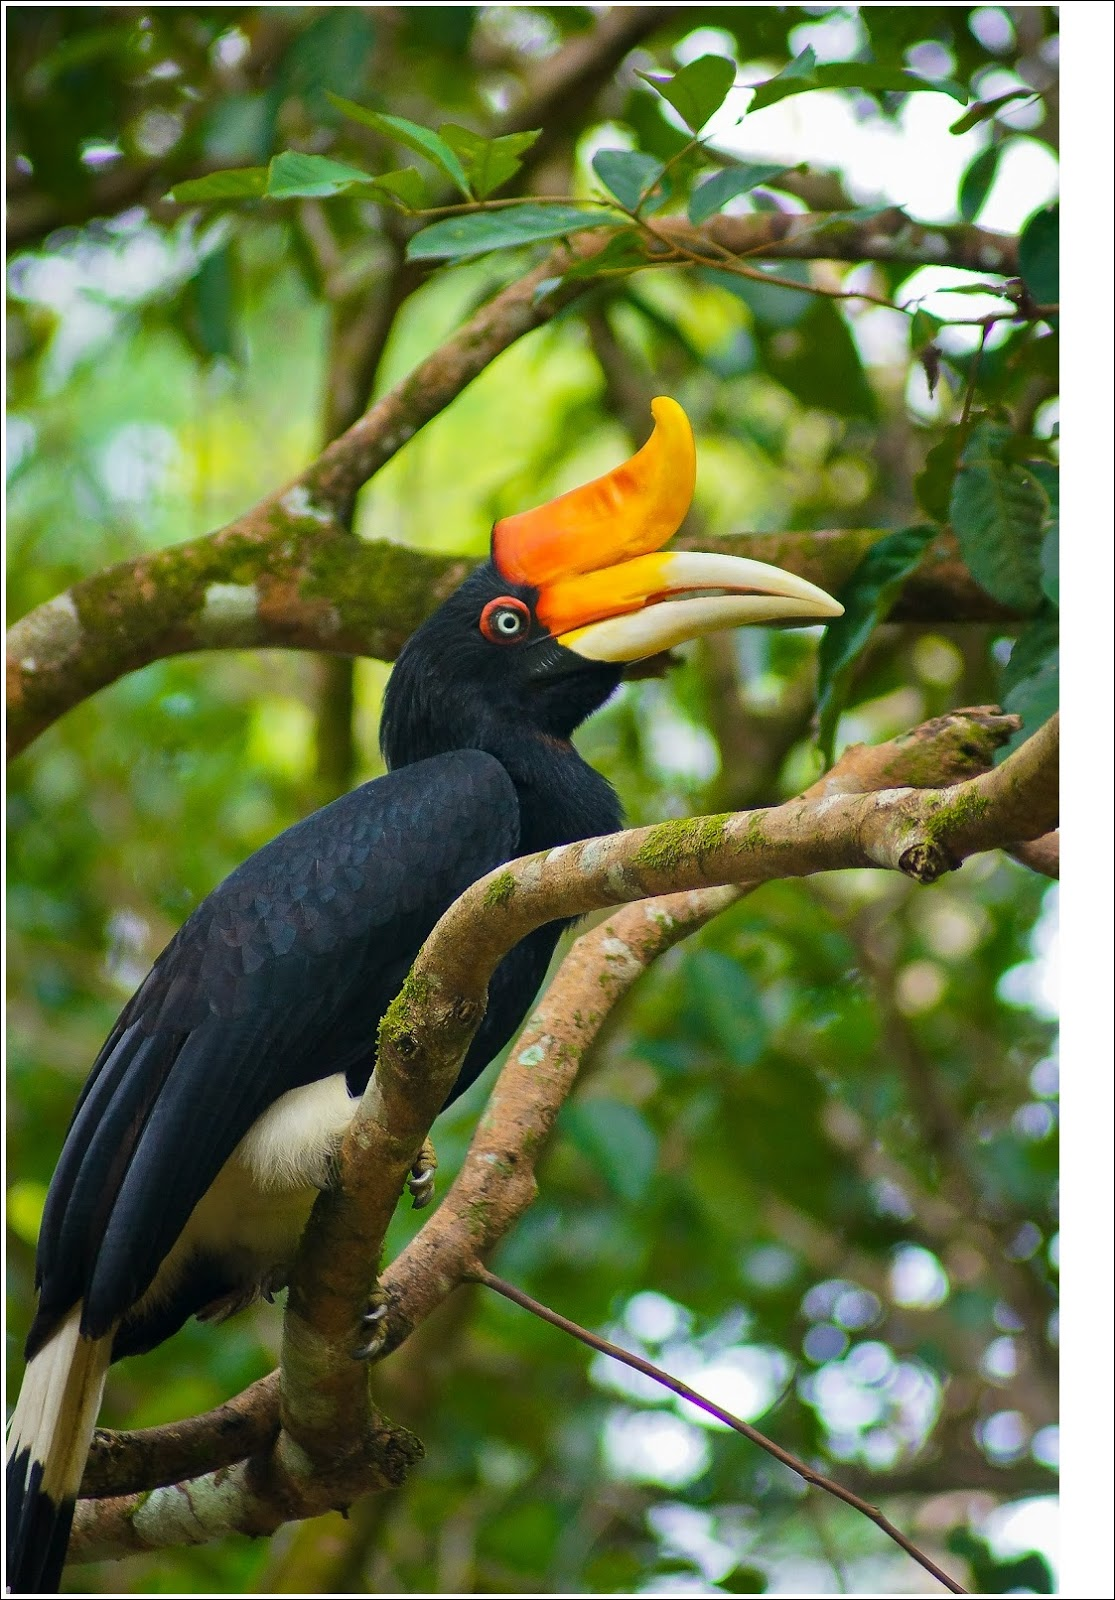 Gambar Burung Cantik Dan Unik  Koleksi Gambar HD